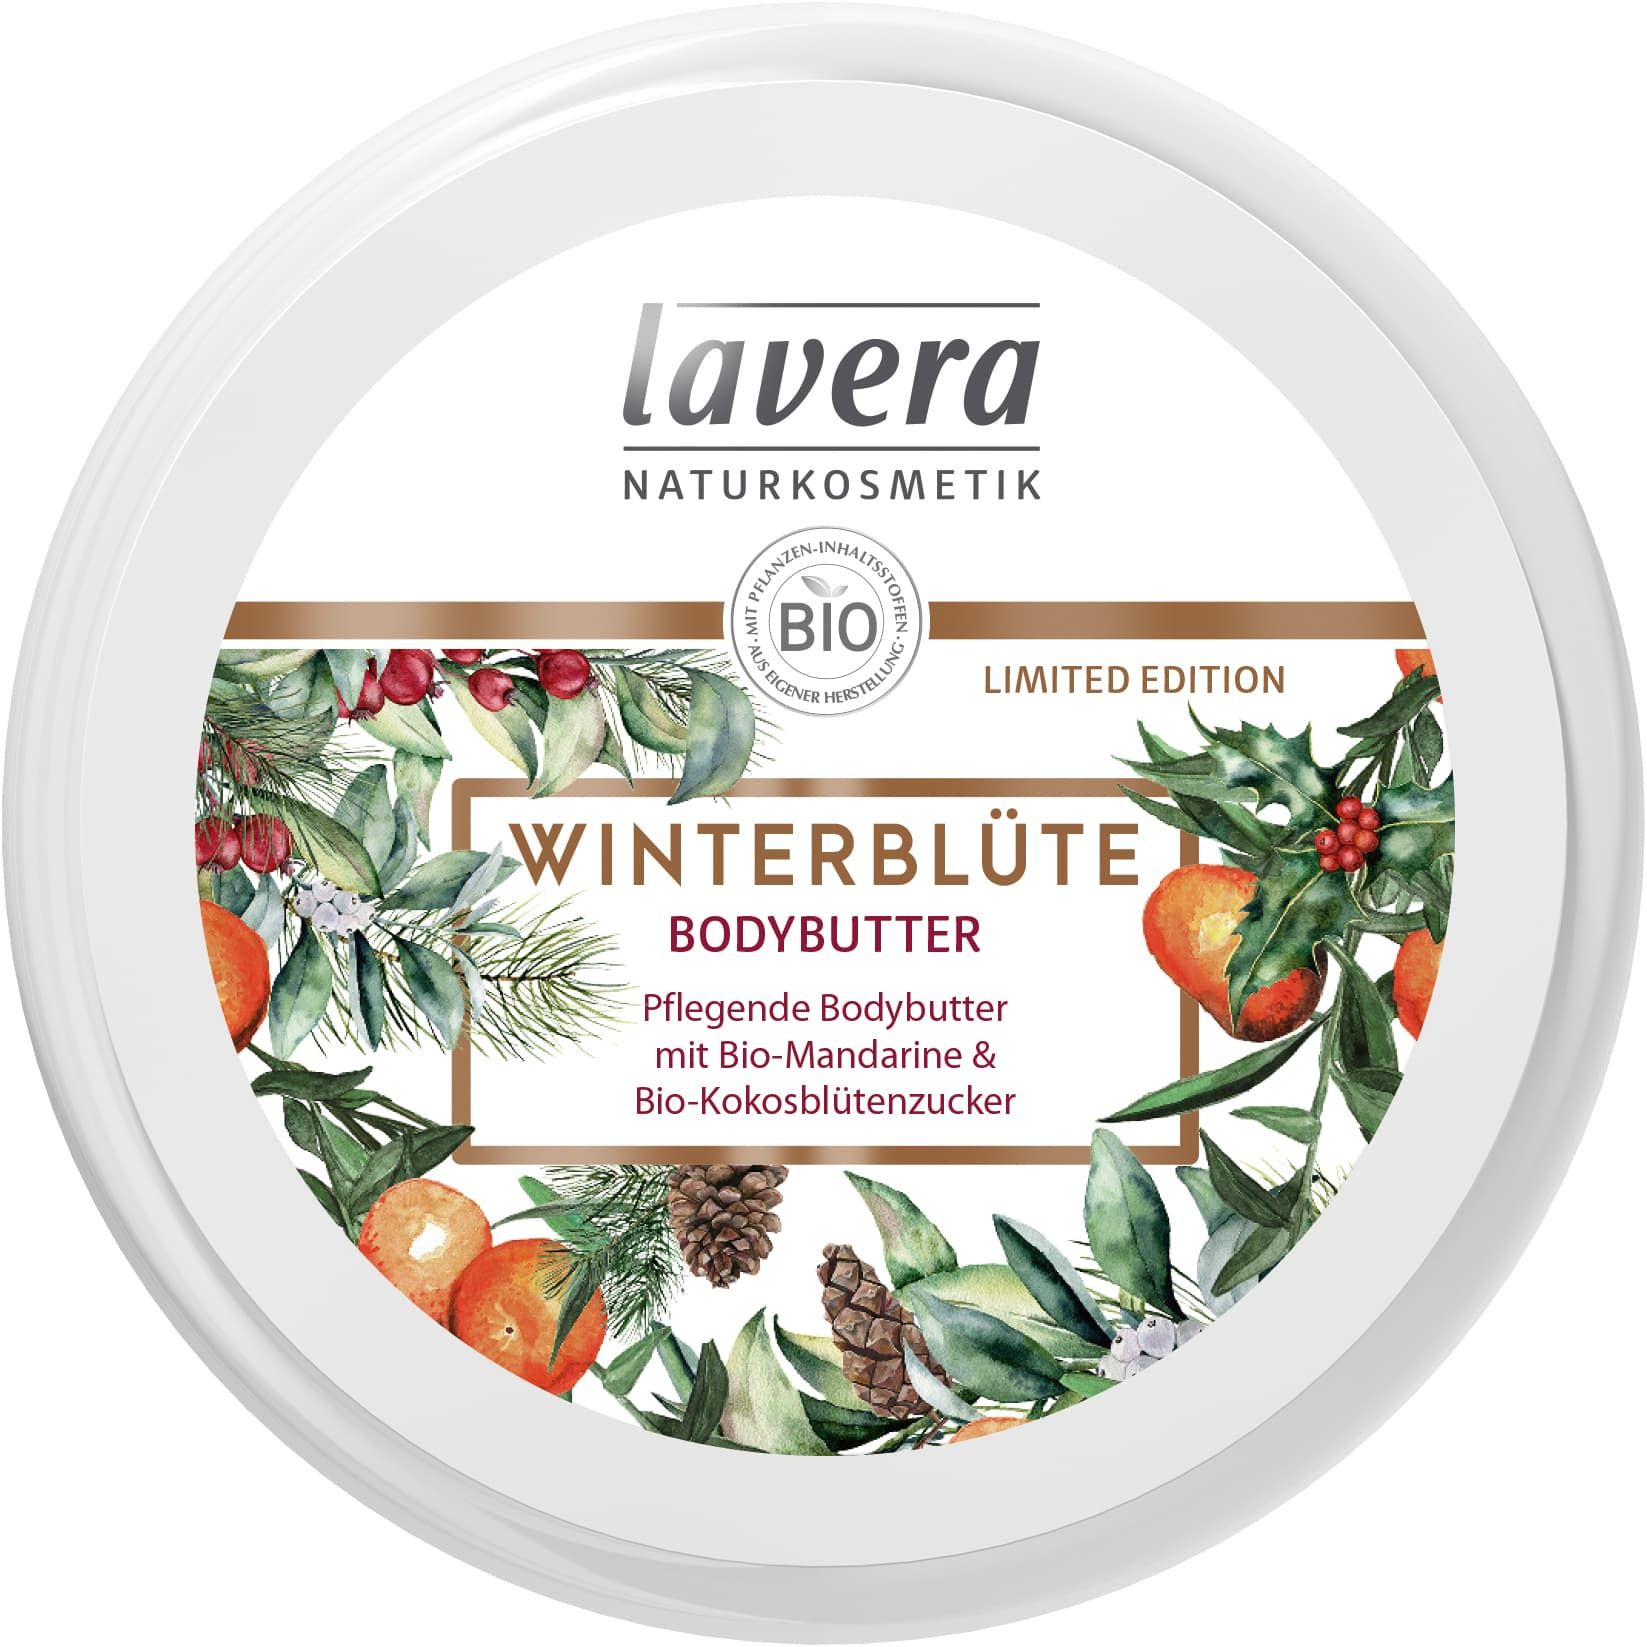 Winter Limited Edition Winterblüte Bodybutter (MHD 01.03.2021)